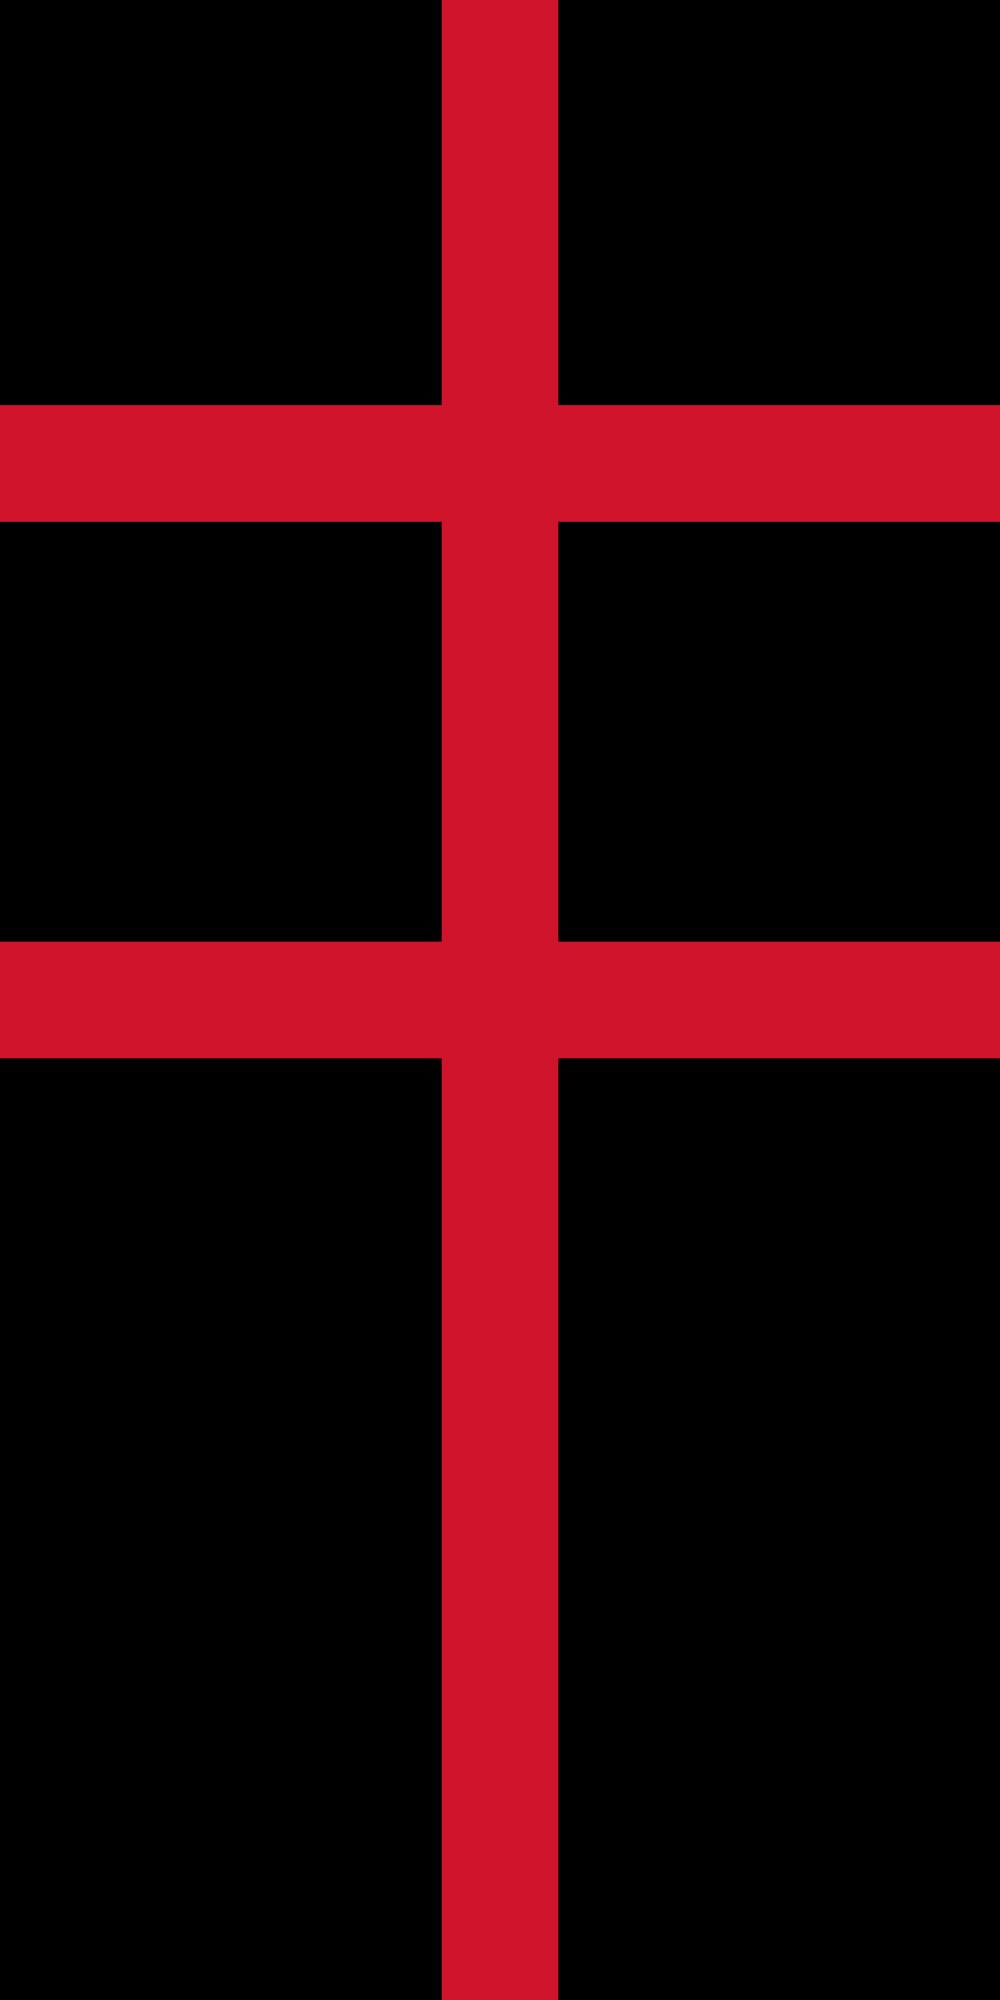 Norsefire v for vendetta wiki fandom powered by wikia norsefire flag 0 biocorpaavc